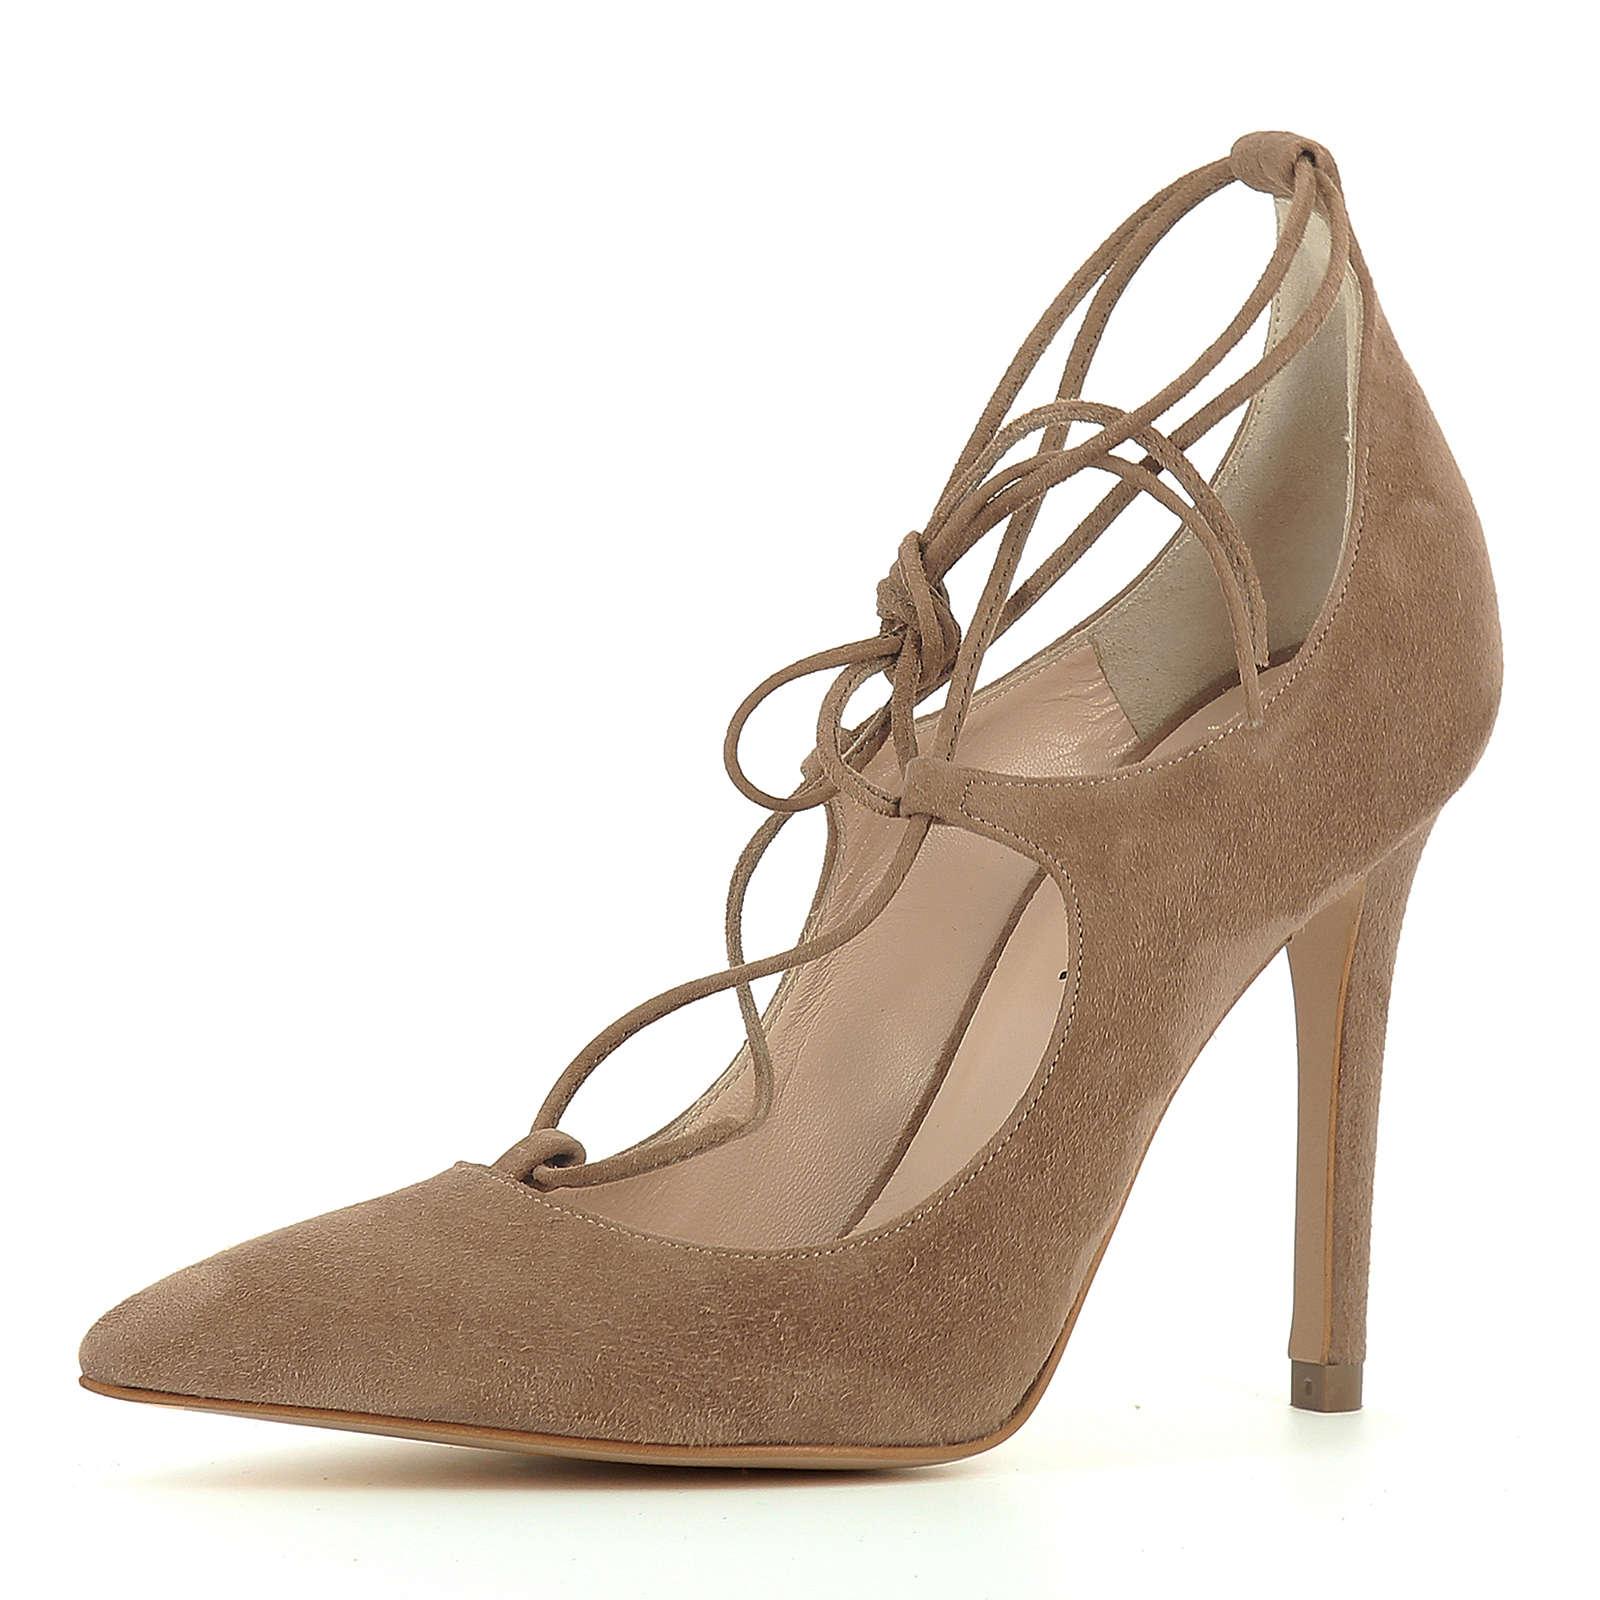 Evita Shoes Pumps braun Damen Gr. 38